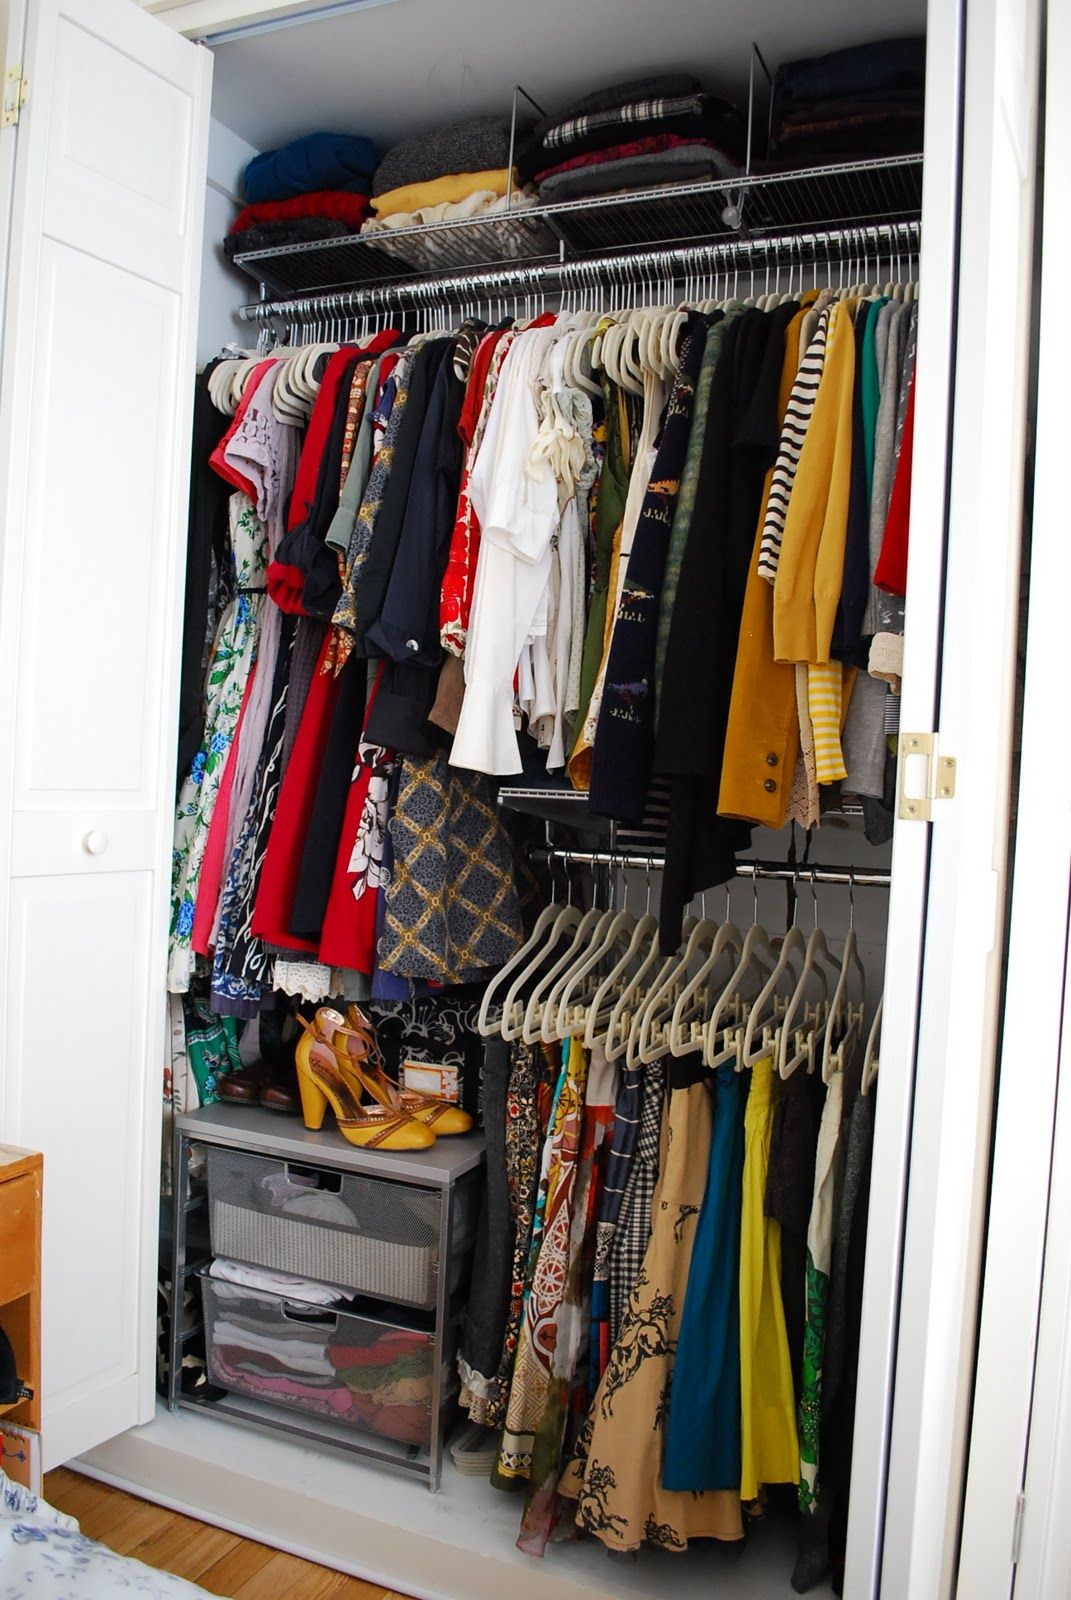 Elfa closet maximizing every inch of vertical space the shelf